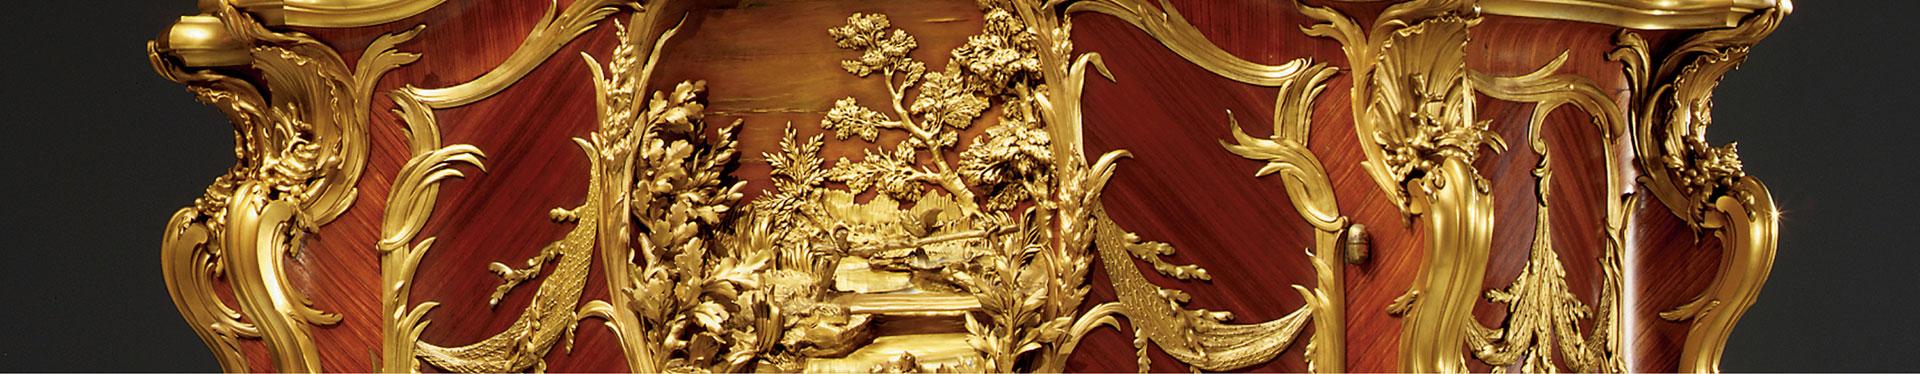 19th-century-furniture-and-sculpture-banner-FINAL_68_1_20170103171406.jpg